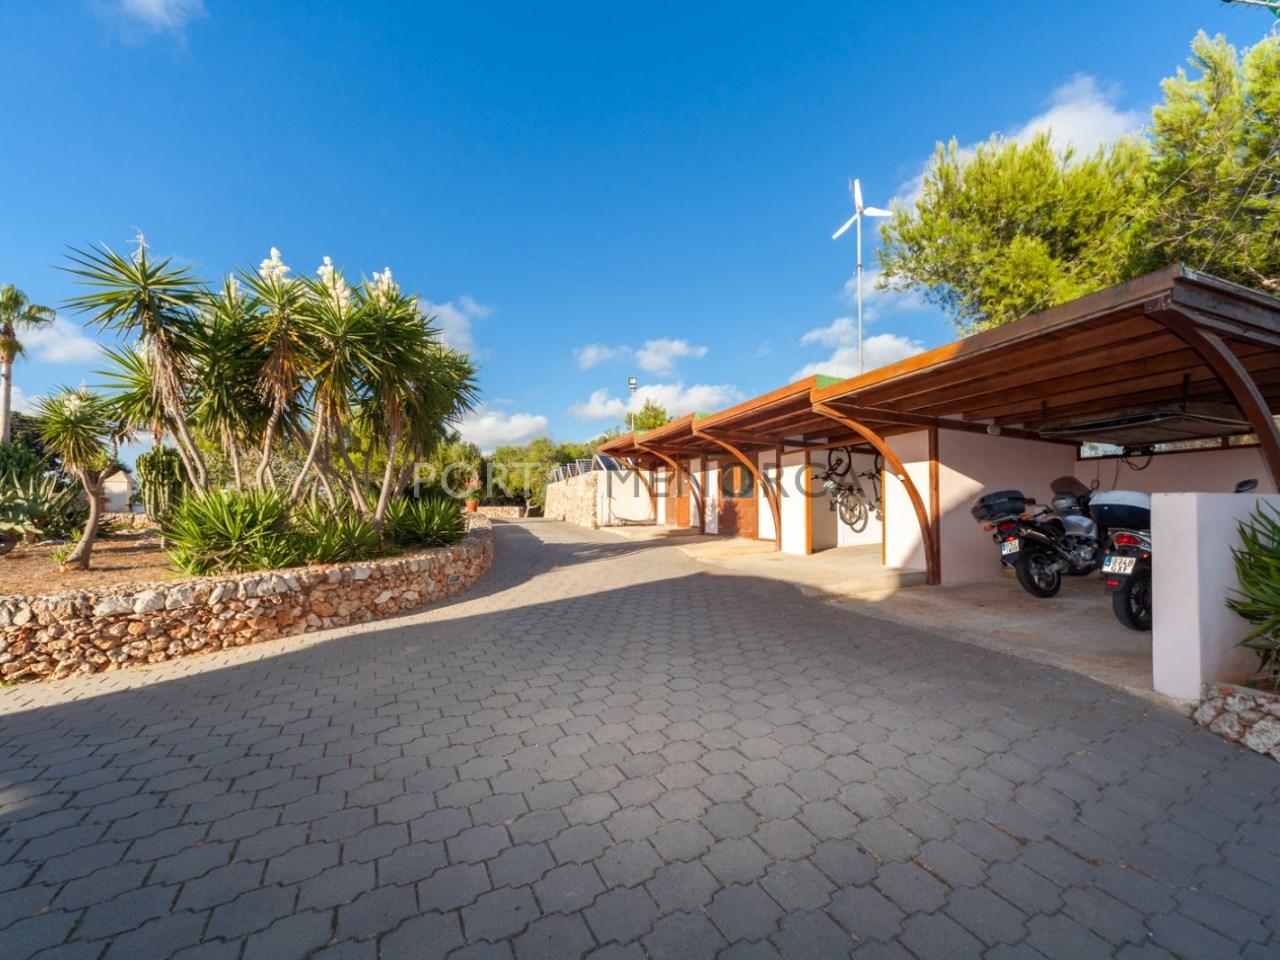 Casa de campo con piscina en Menorca (33 de 41)